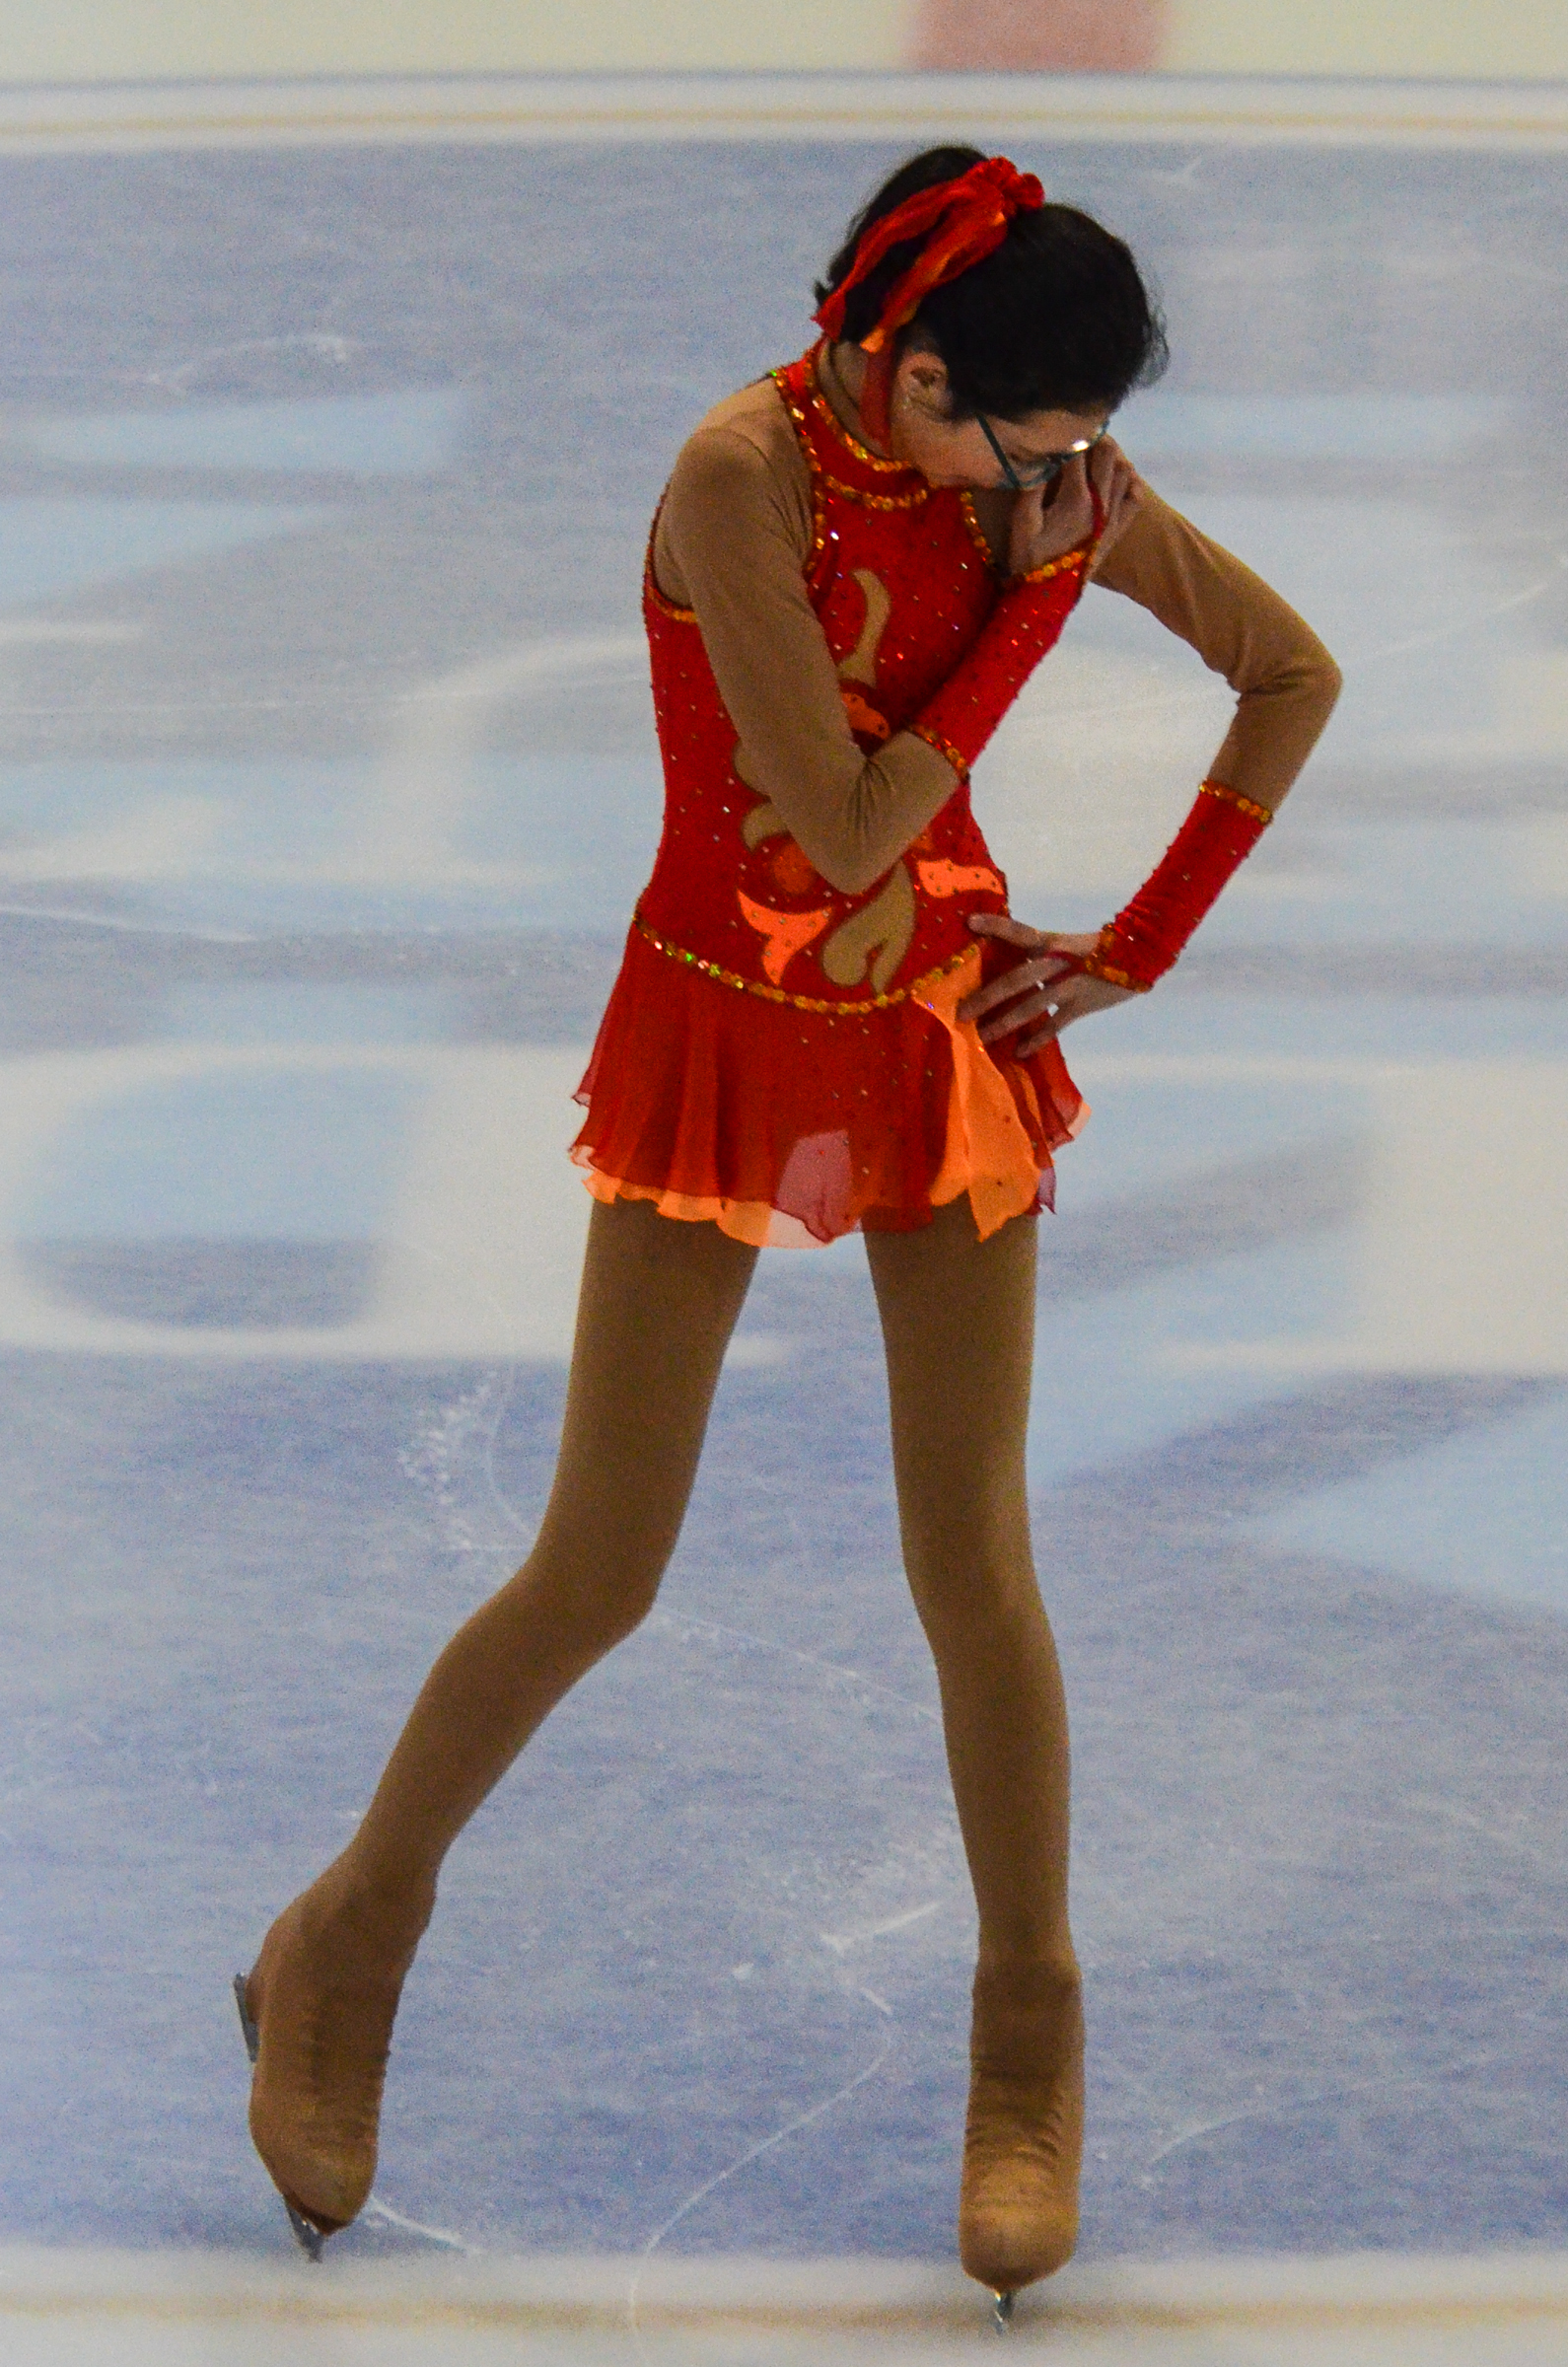 Cheyenne Jaeger